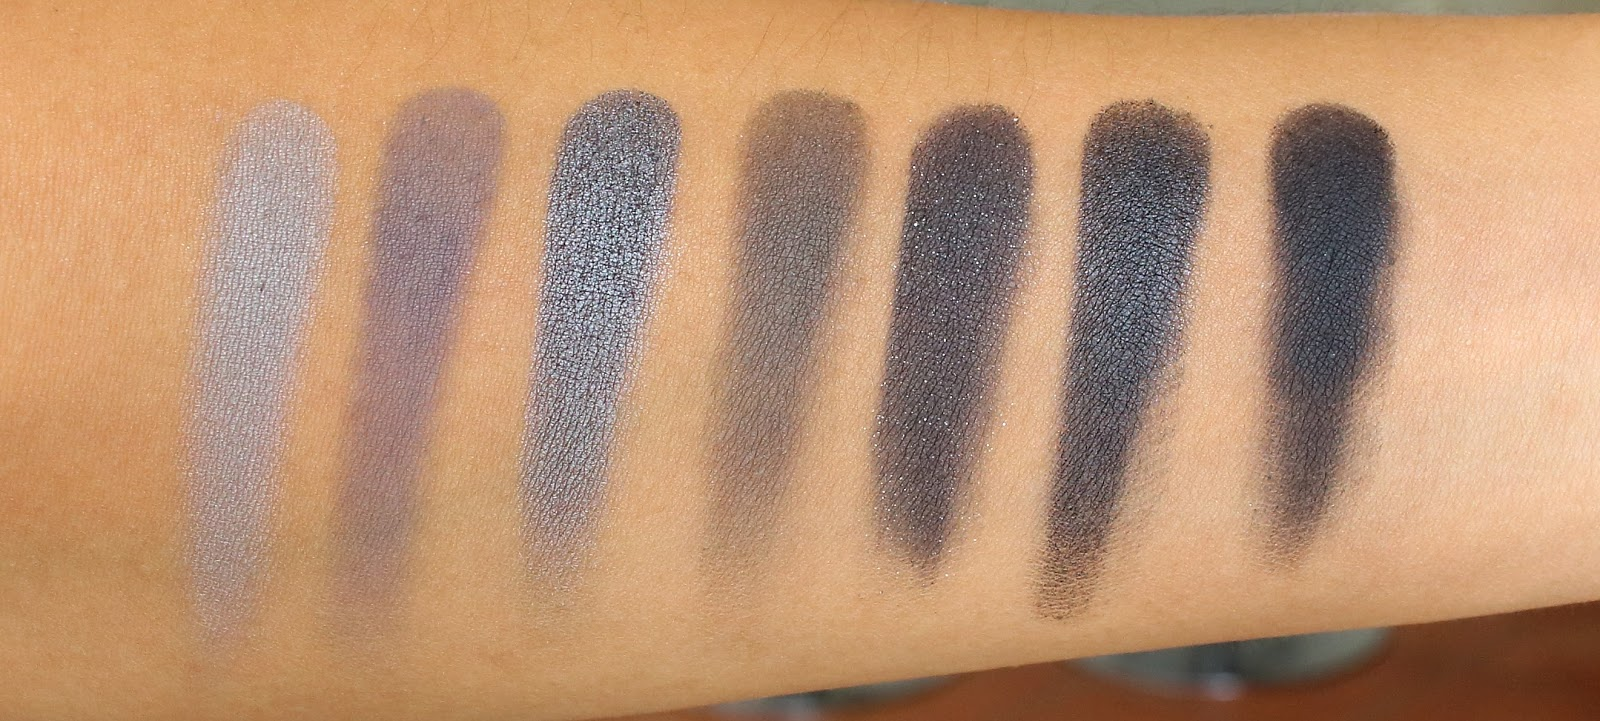 Morphe 35k eyeshadow palette review beauty in bold - Fifth Row